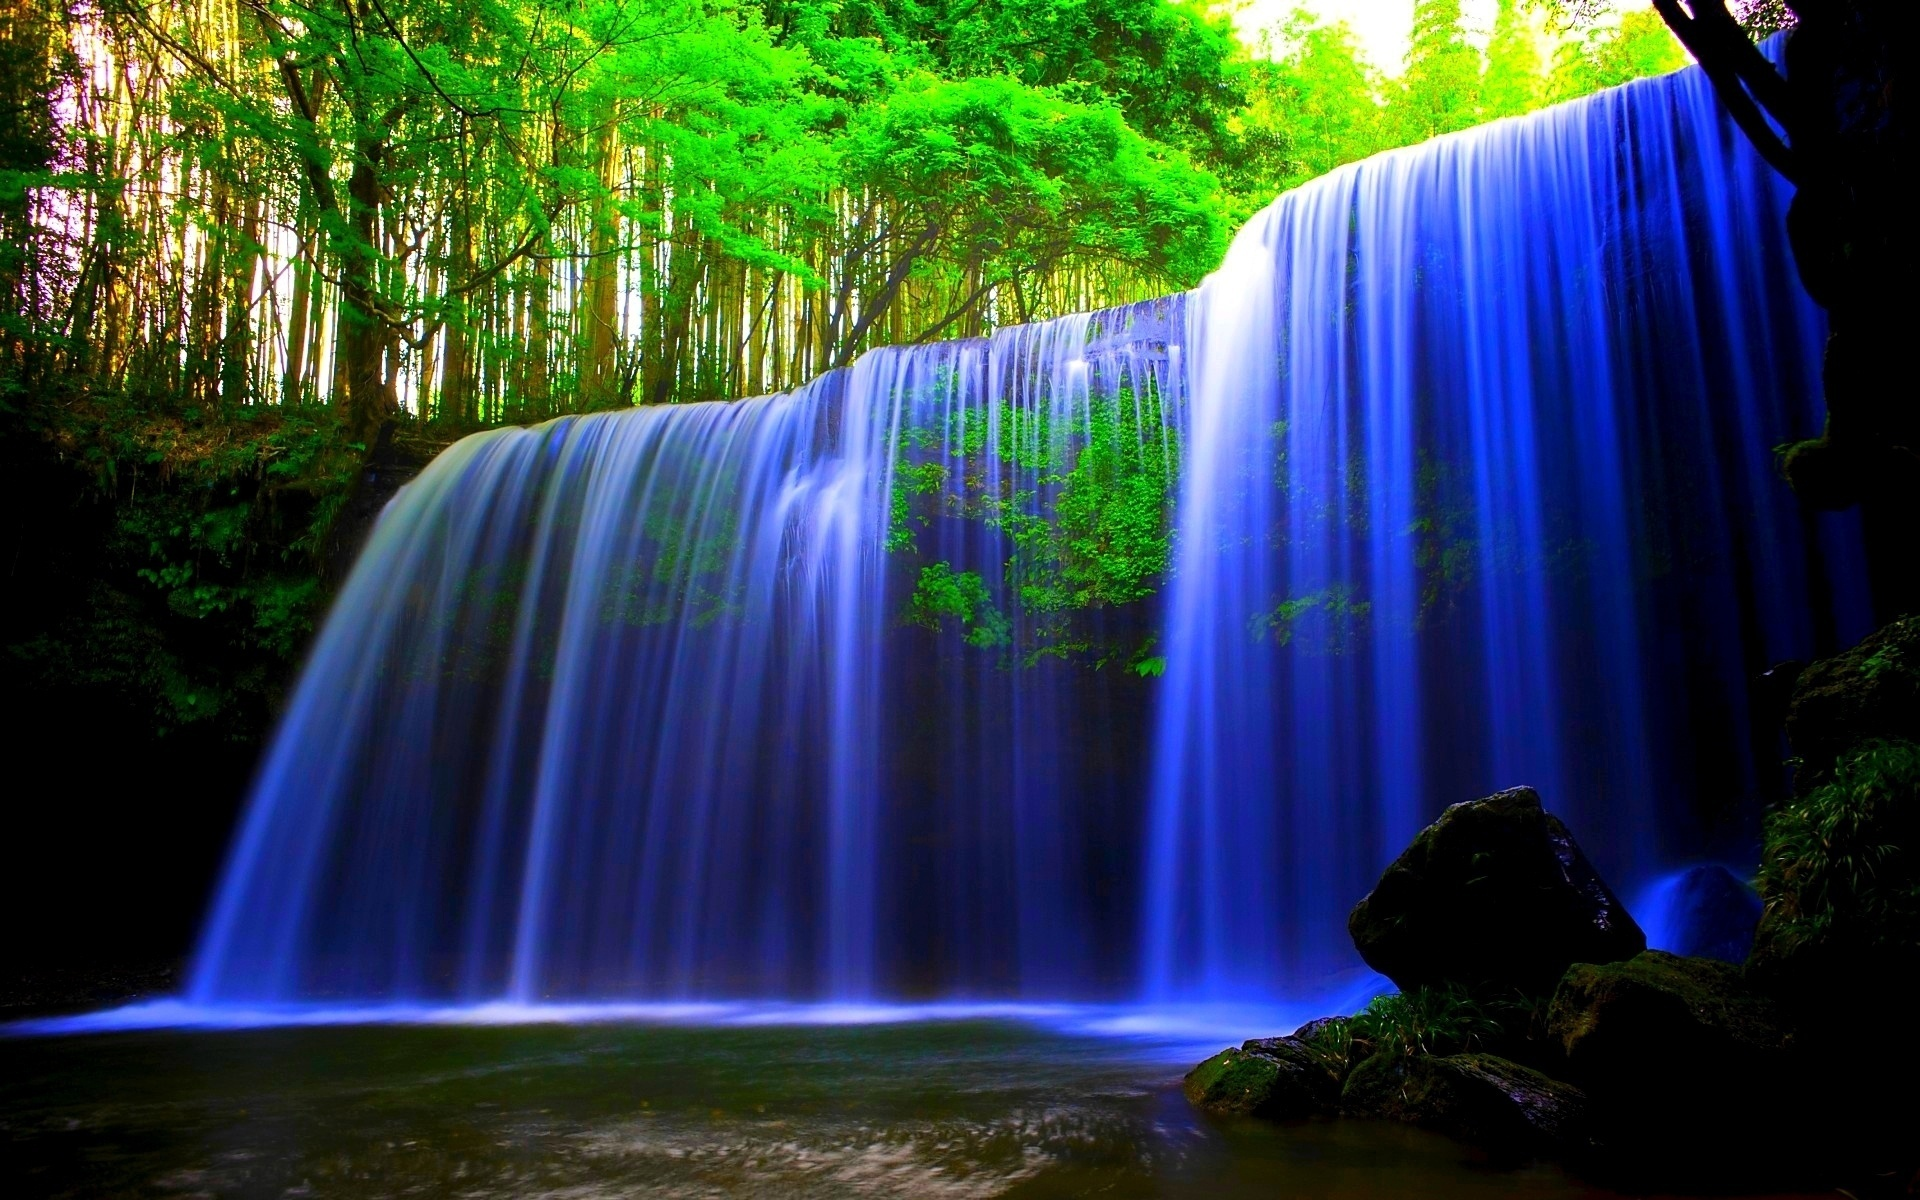 Blue Waterfall Forest Wallpaper in 1920x1200 Widescreen